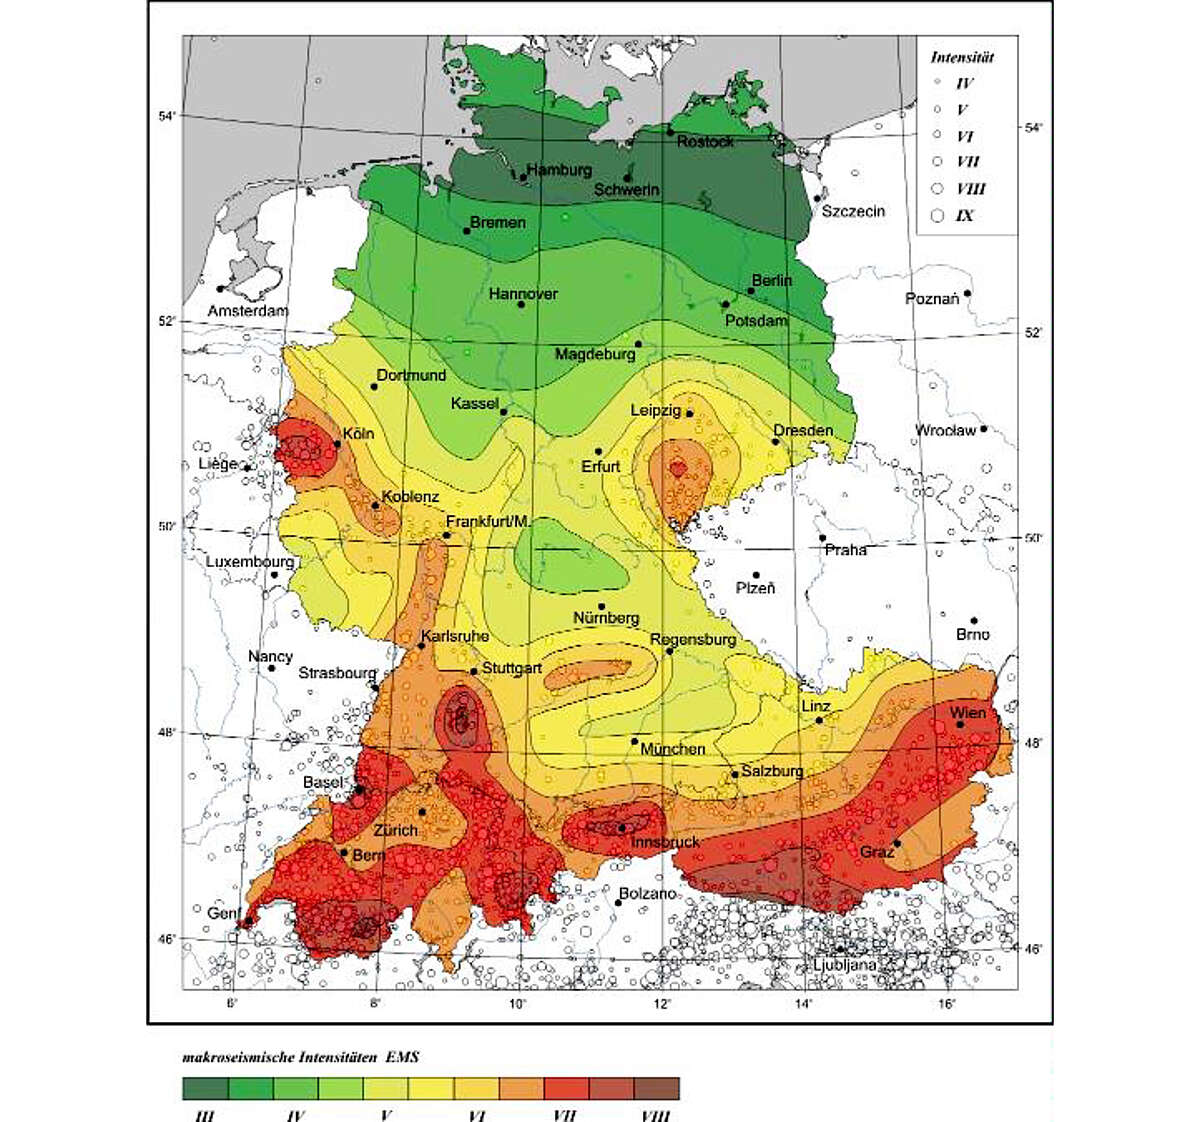 karte erdbebenzonen deutschland Erdbebengefährdung in Deutschland   ESKP